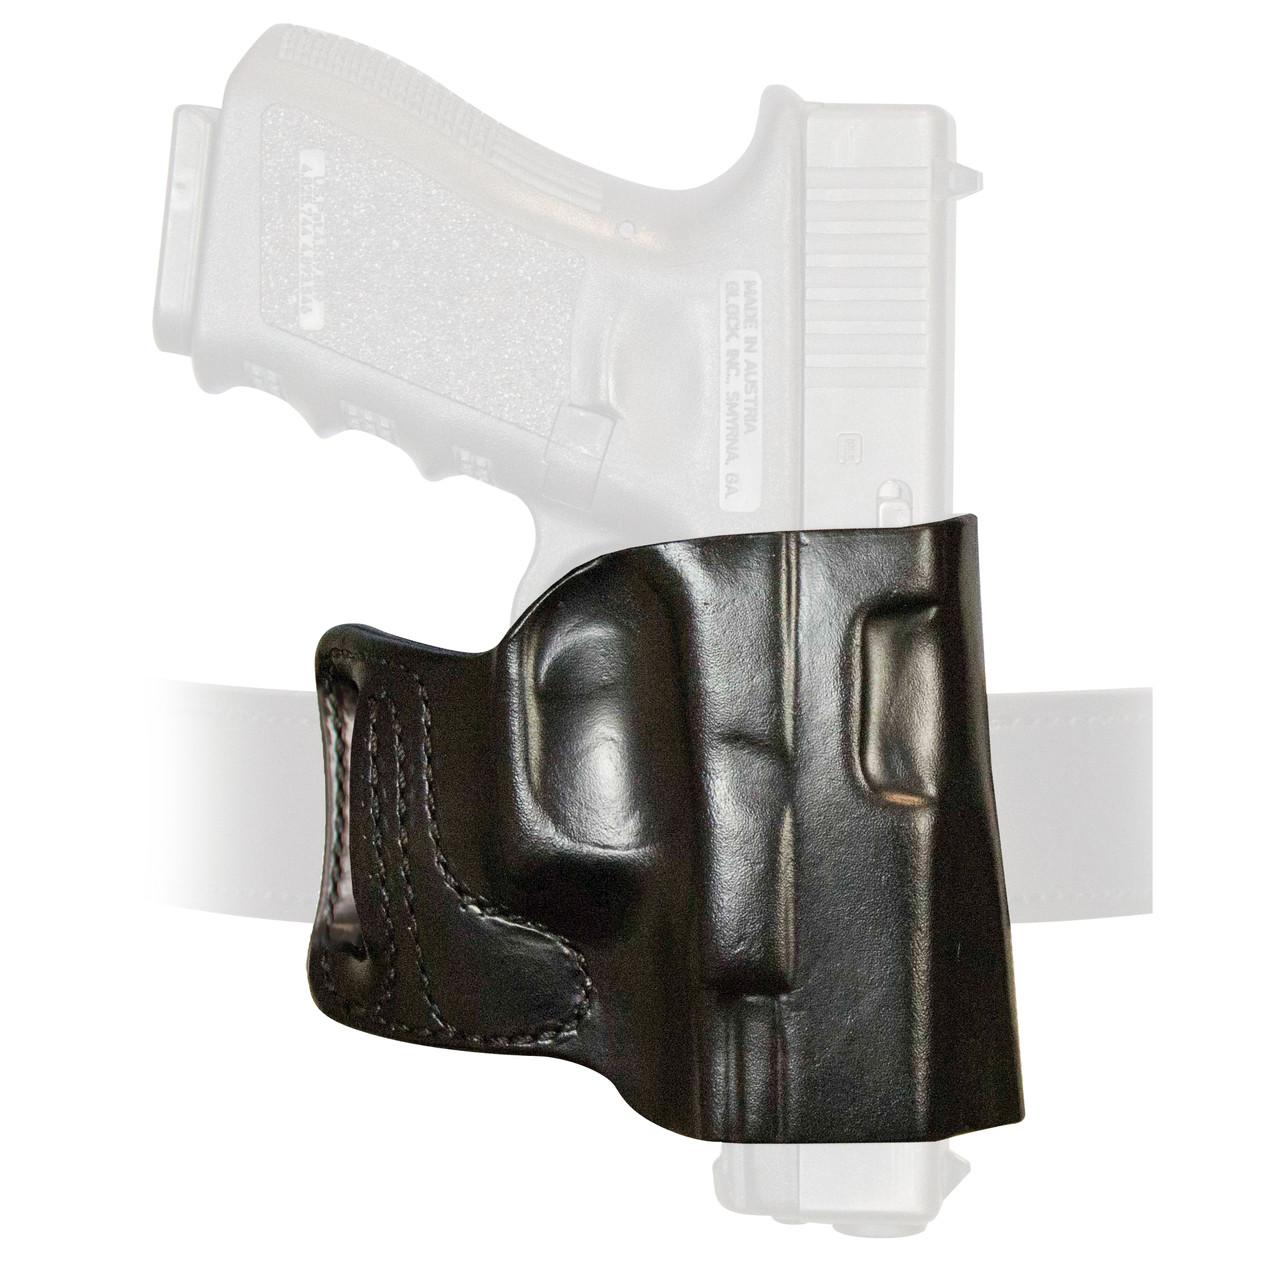 DeSantis 115BAB2Z0 E-GAT Slide Belt Holster RH Black Fits Glock 17//19//22//23